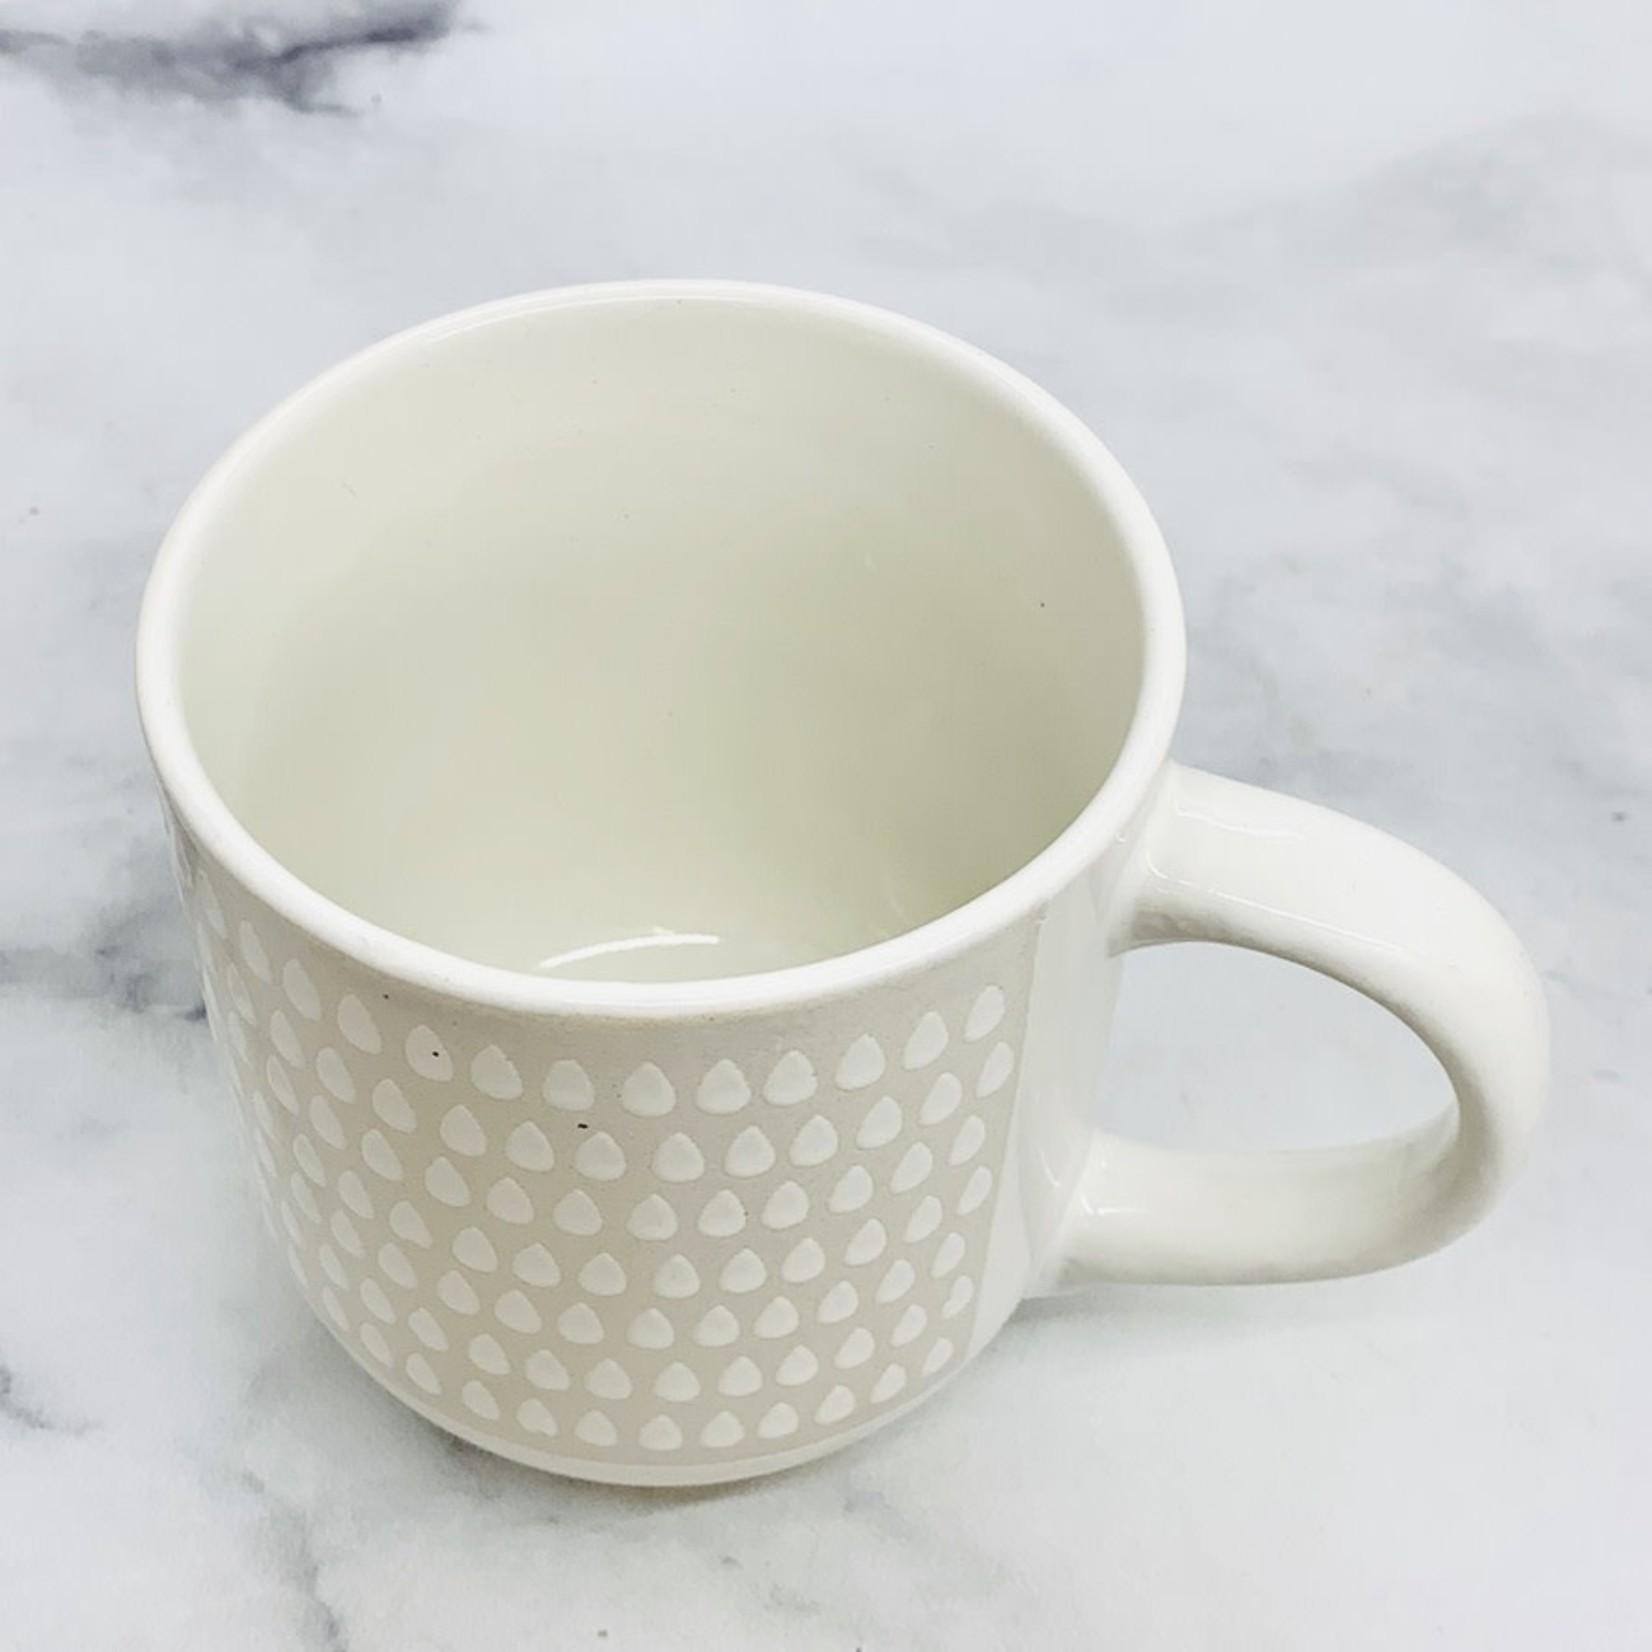 Cloudburst Mug